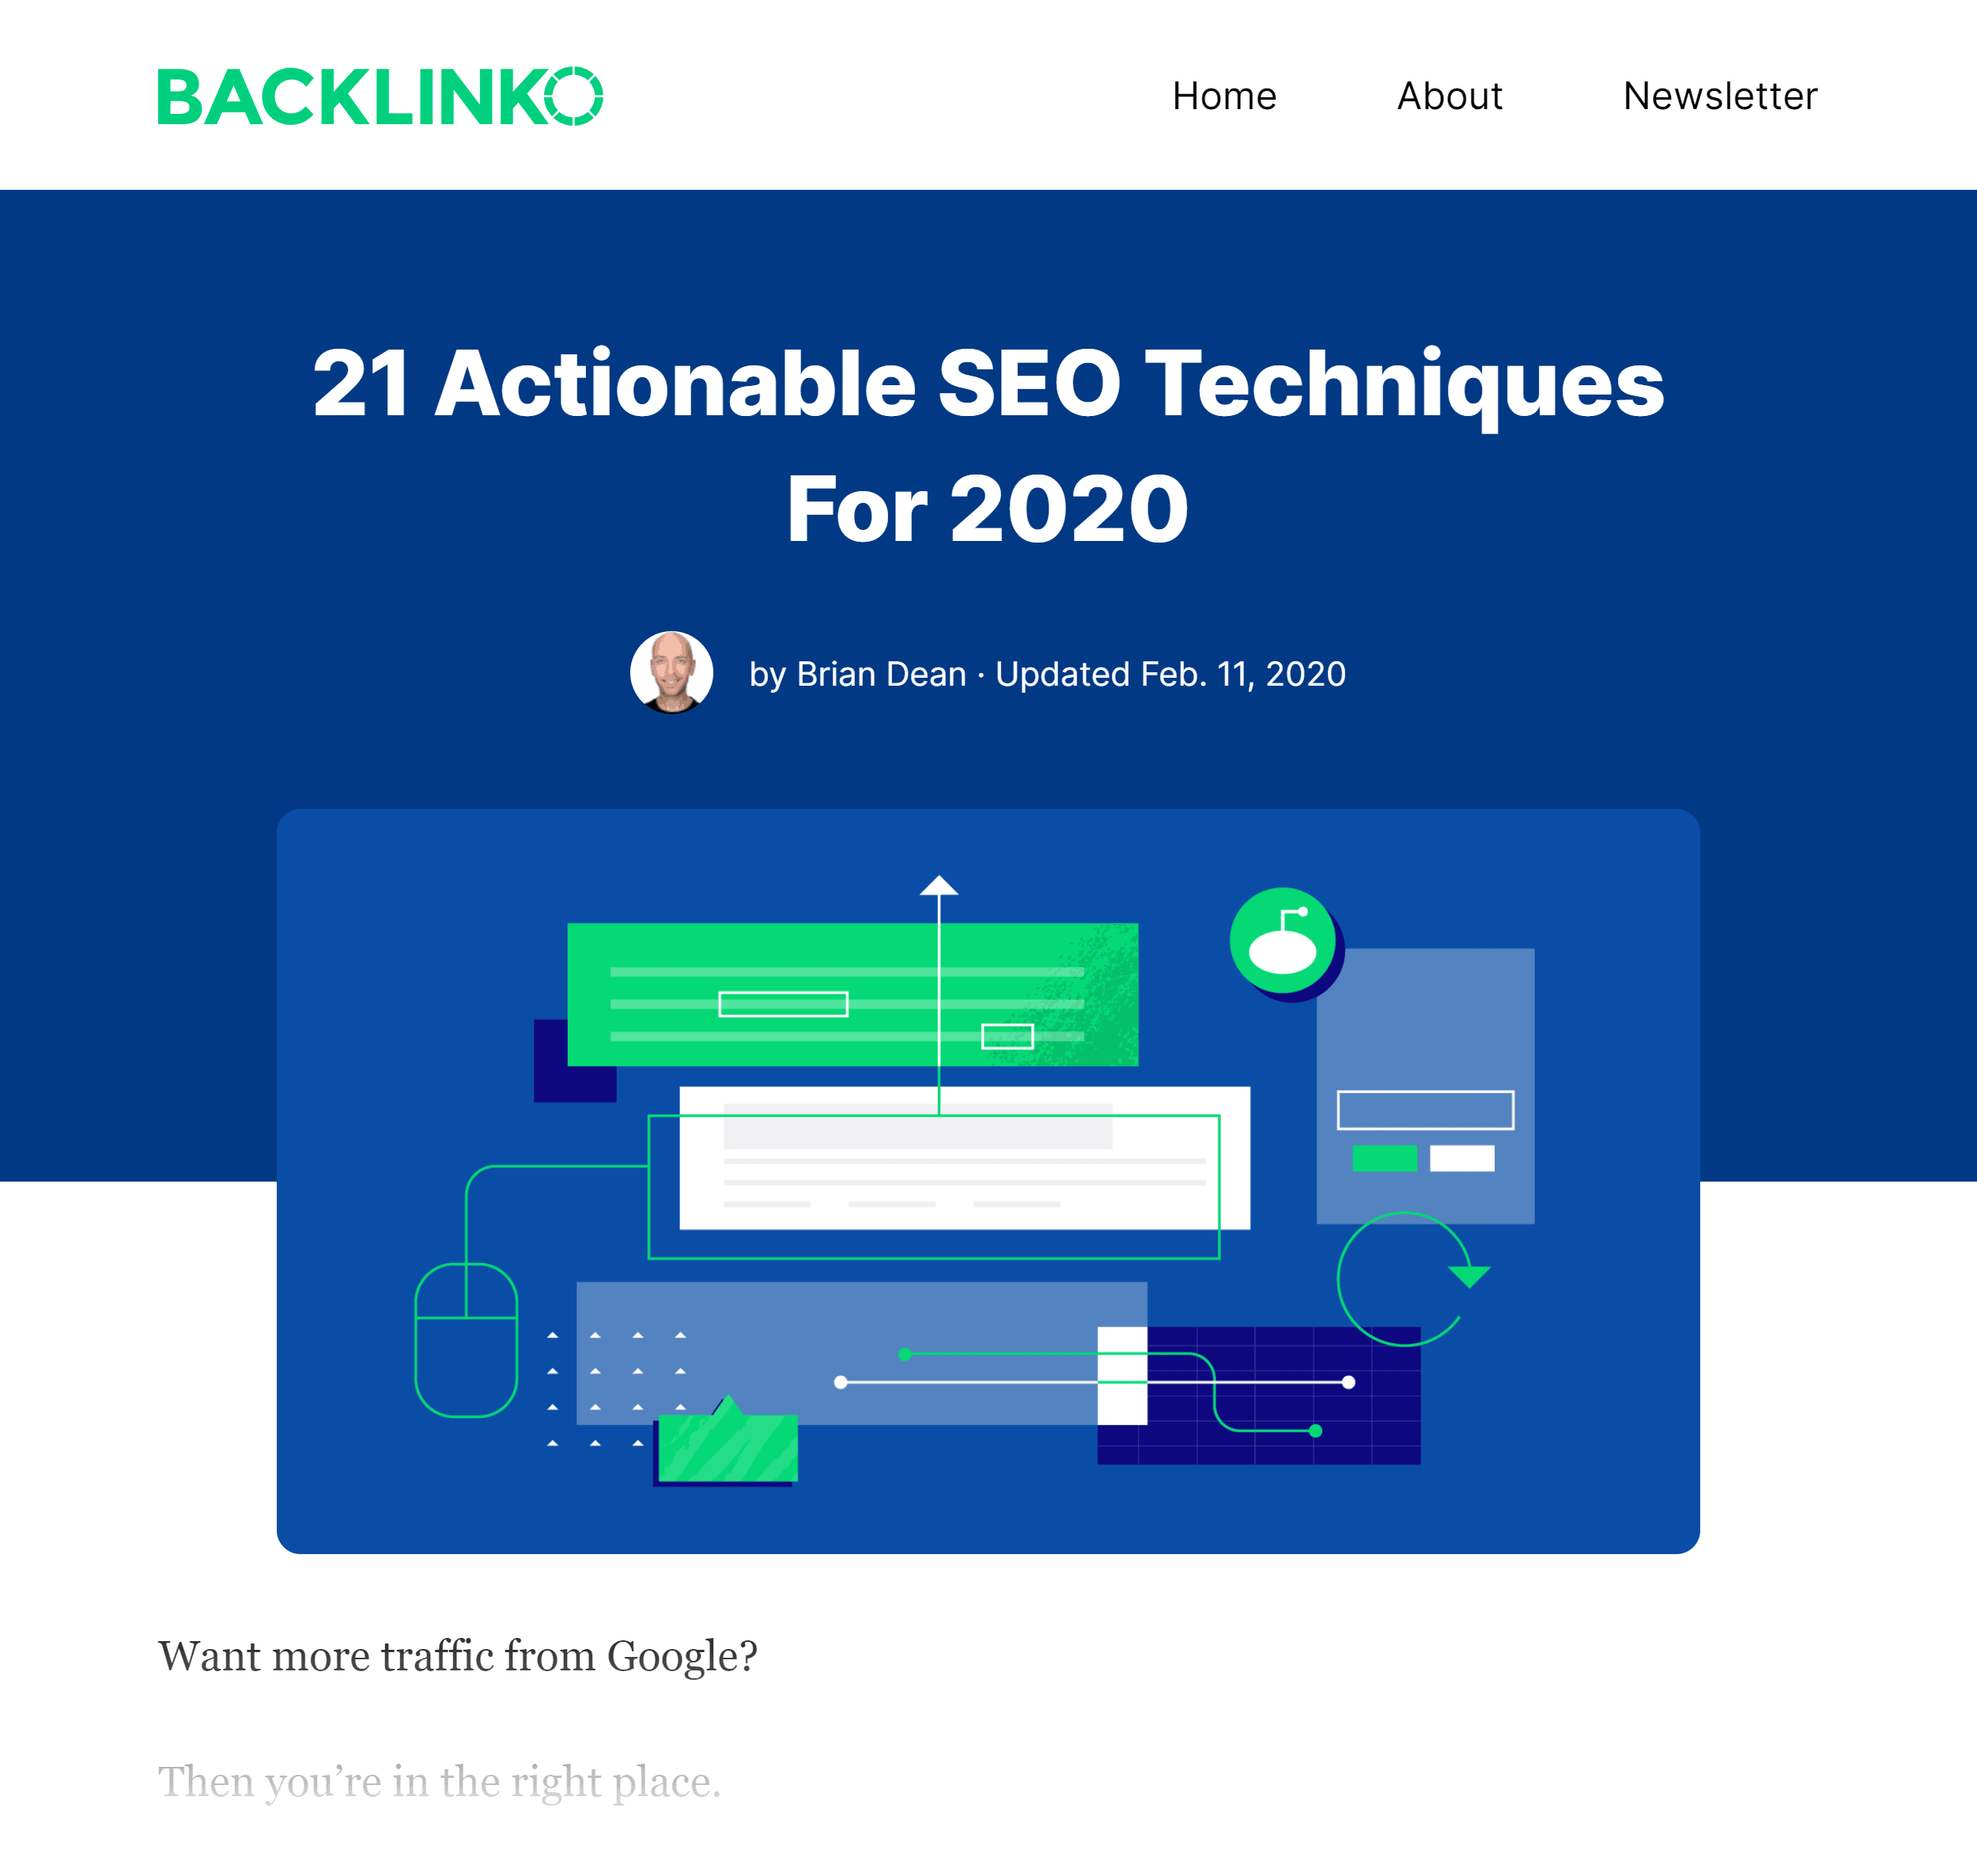 Backlinko – SEO Techniques Post